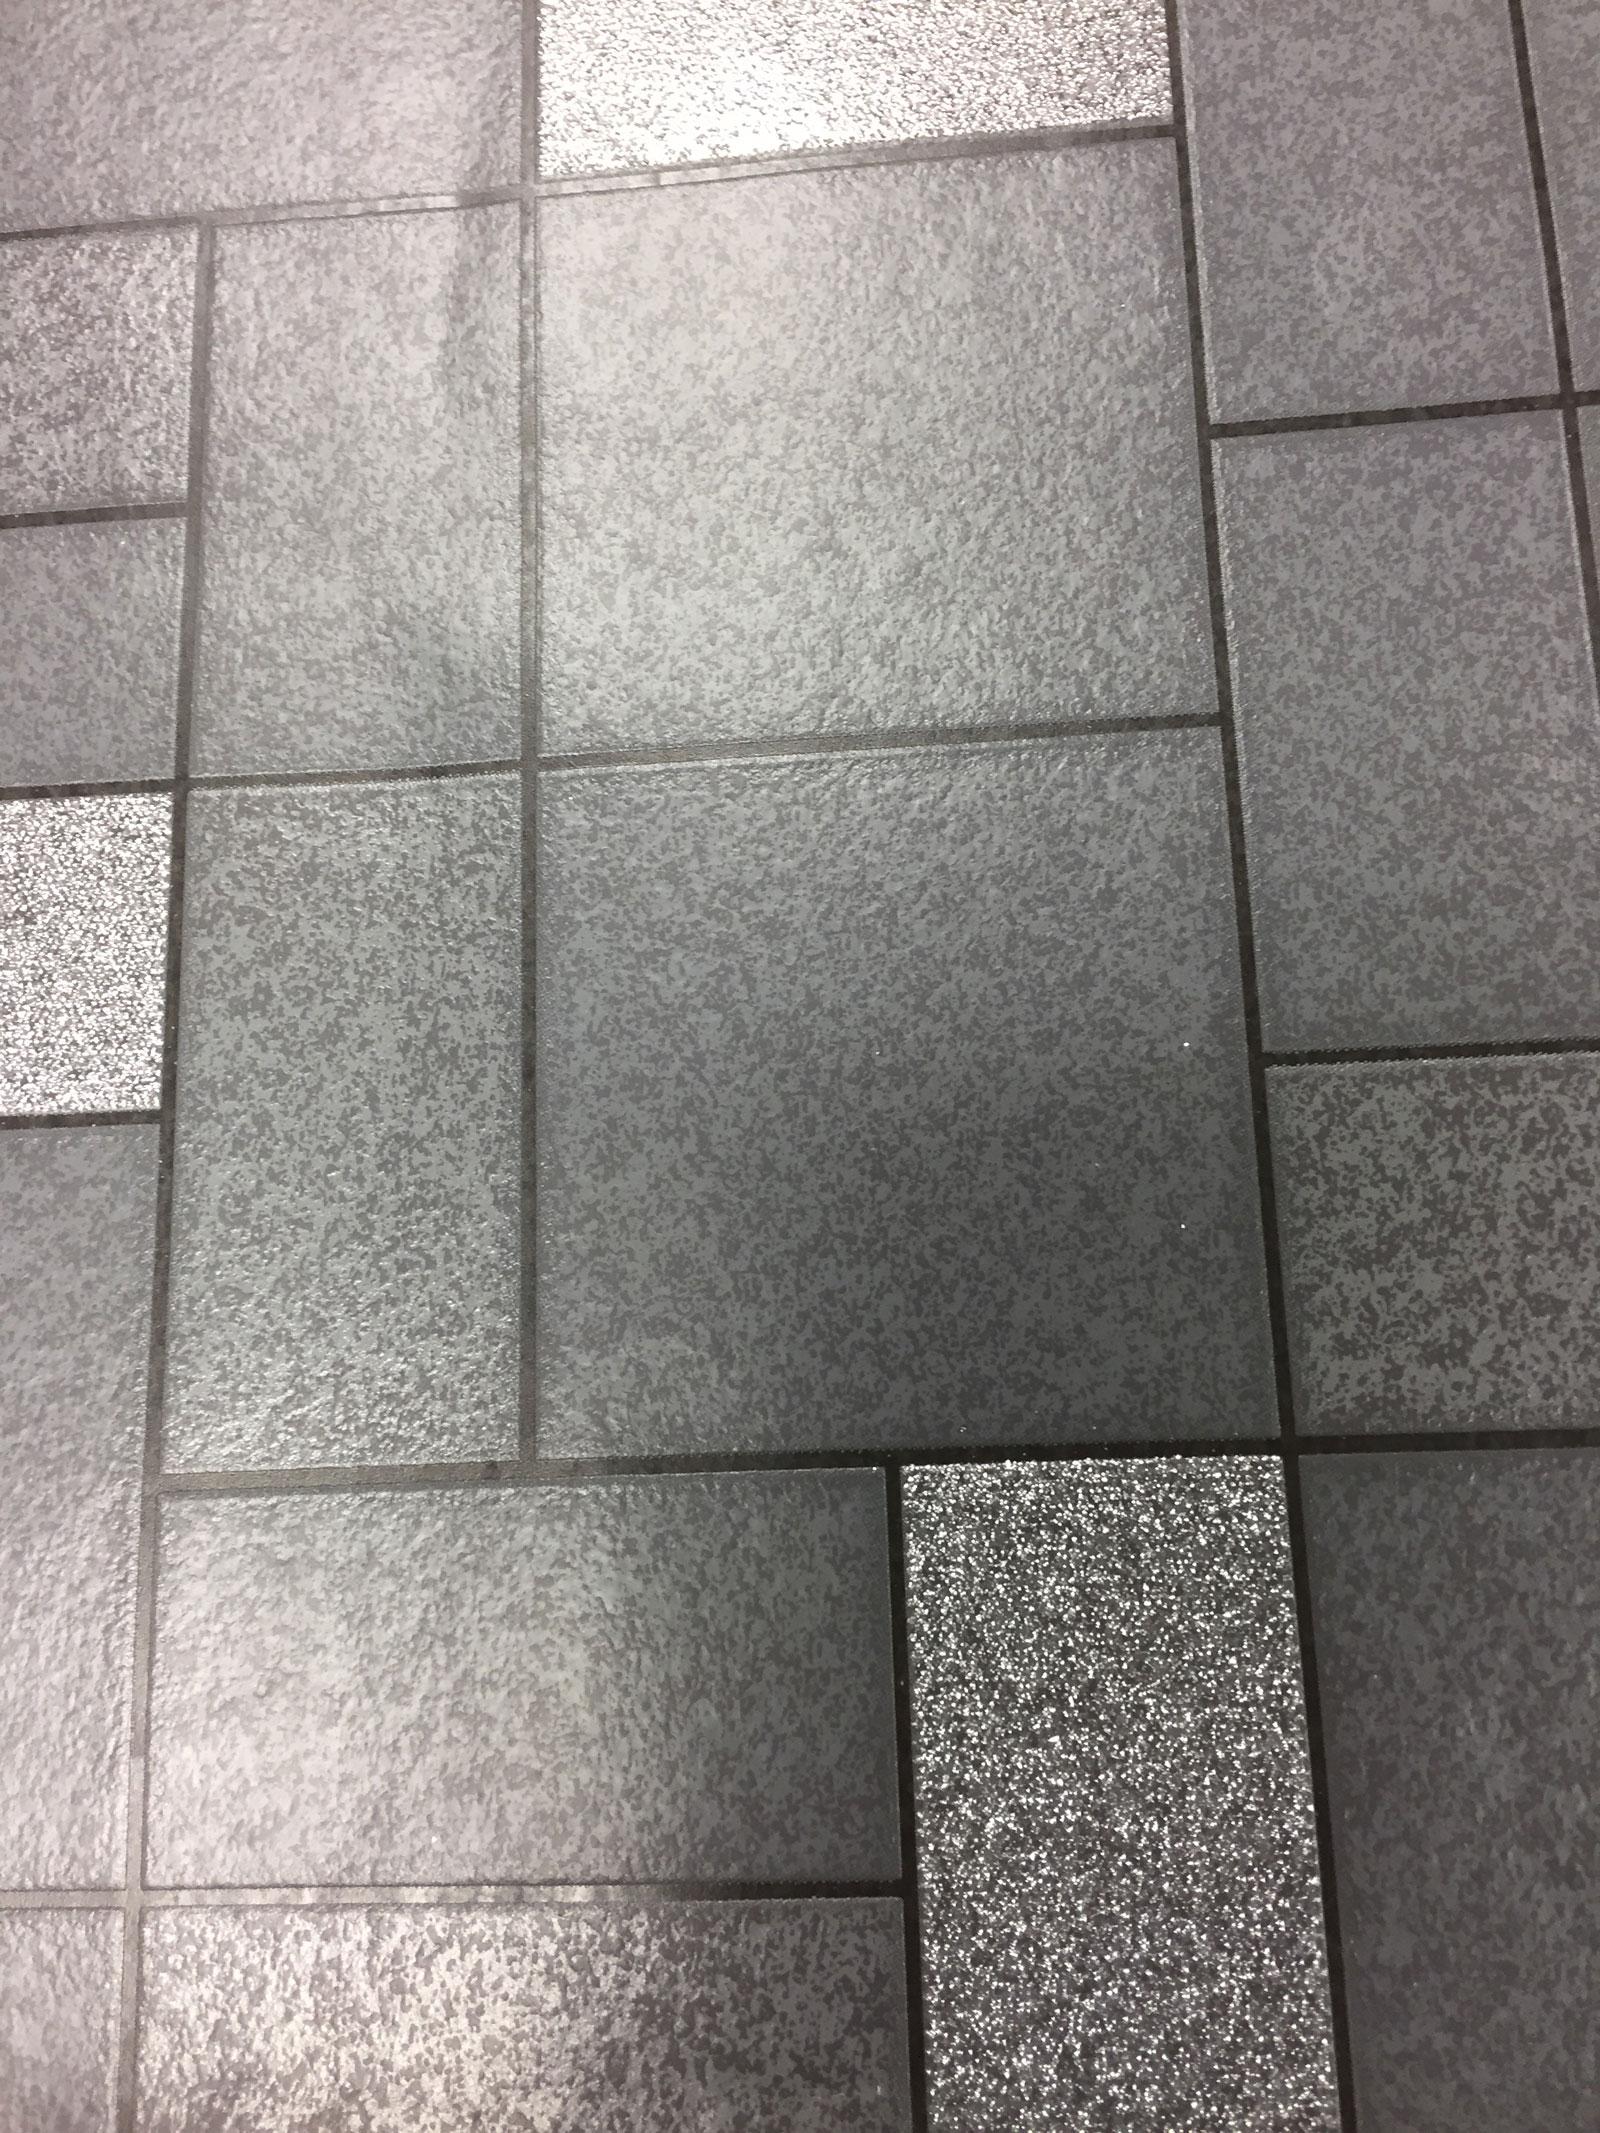 Glitter Tile Wallpaper Sparkle Washable Vinyl Kitchen Bathroom Black Silver